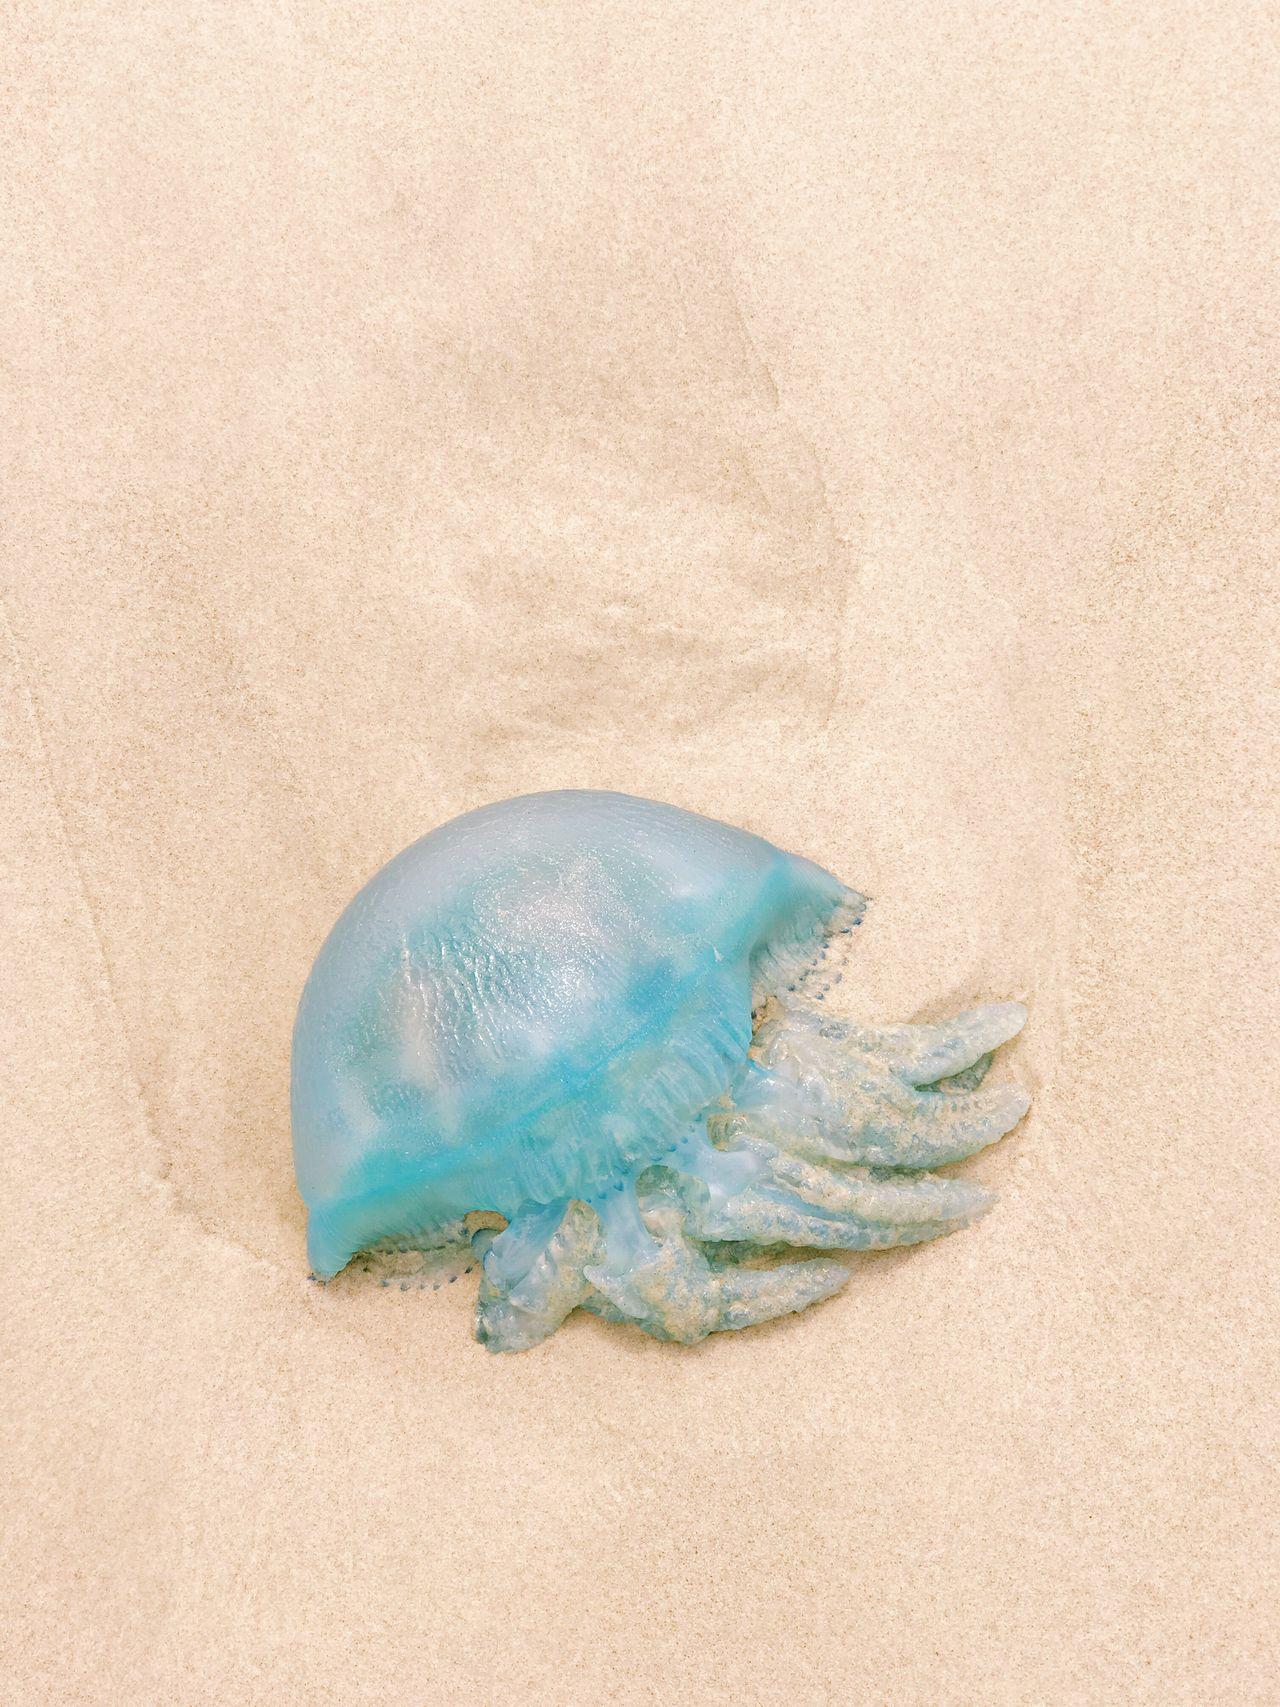 No People Sea Life Beach EyeEmNewHere Day Nature Jellyfish